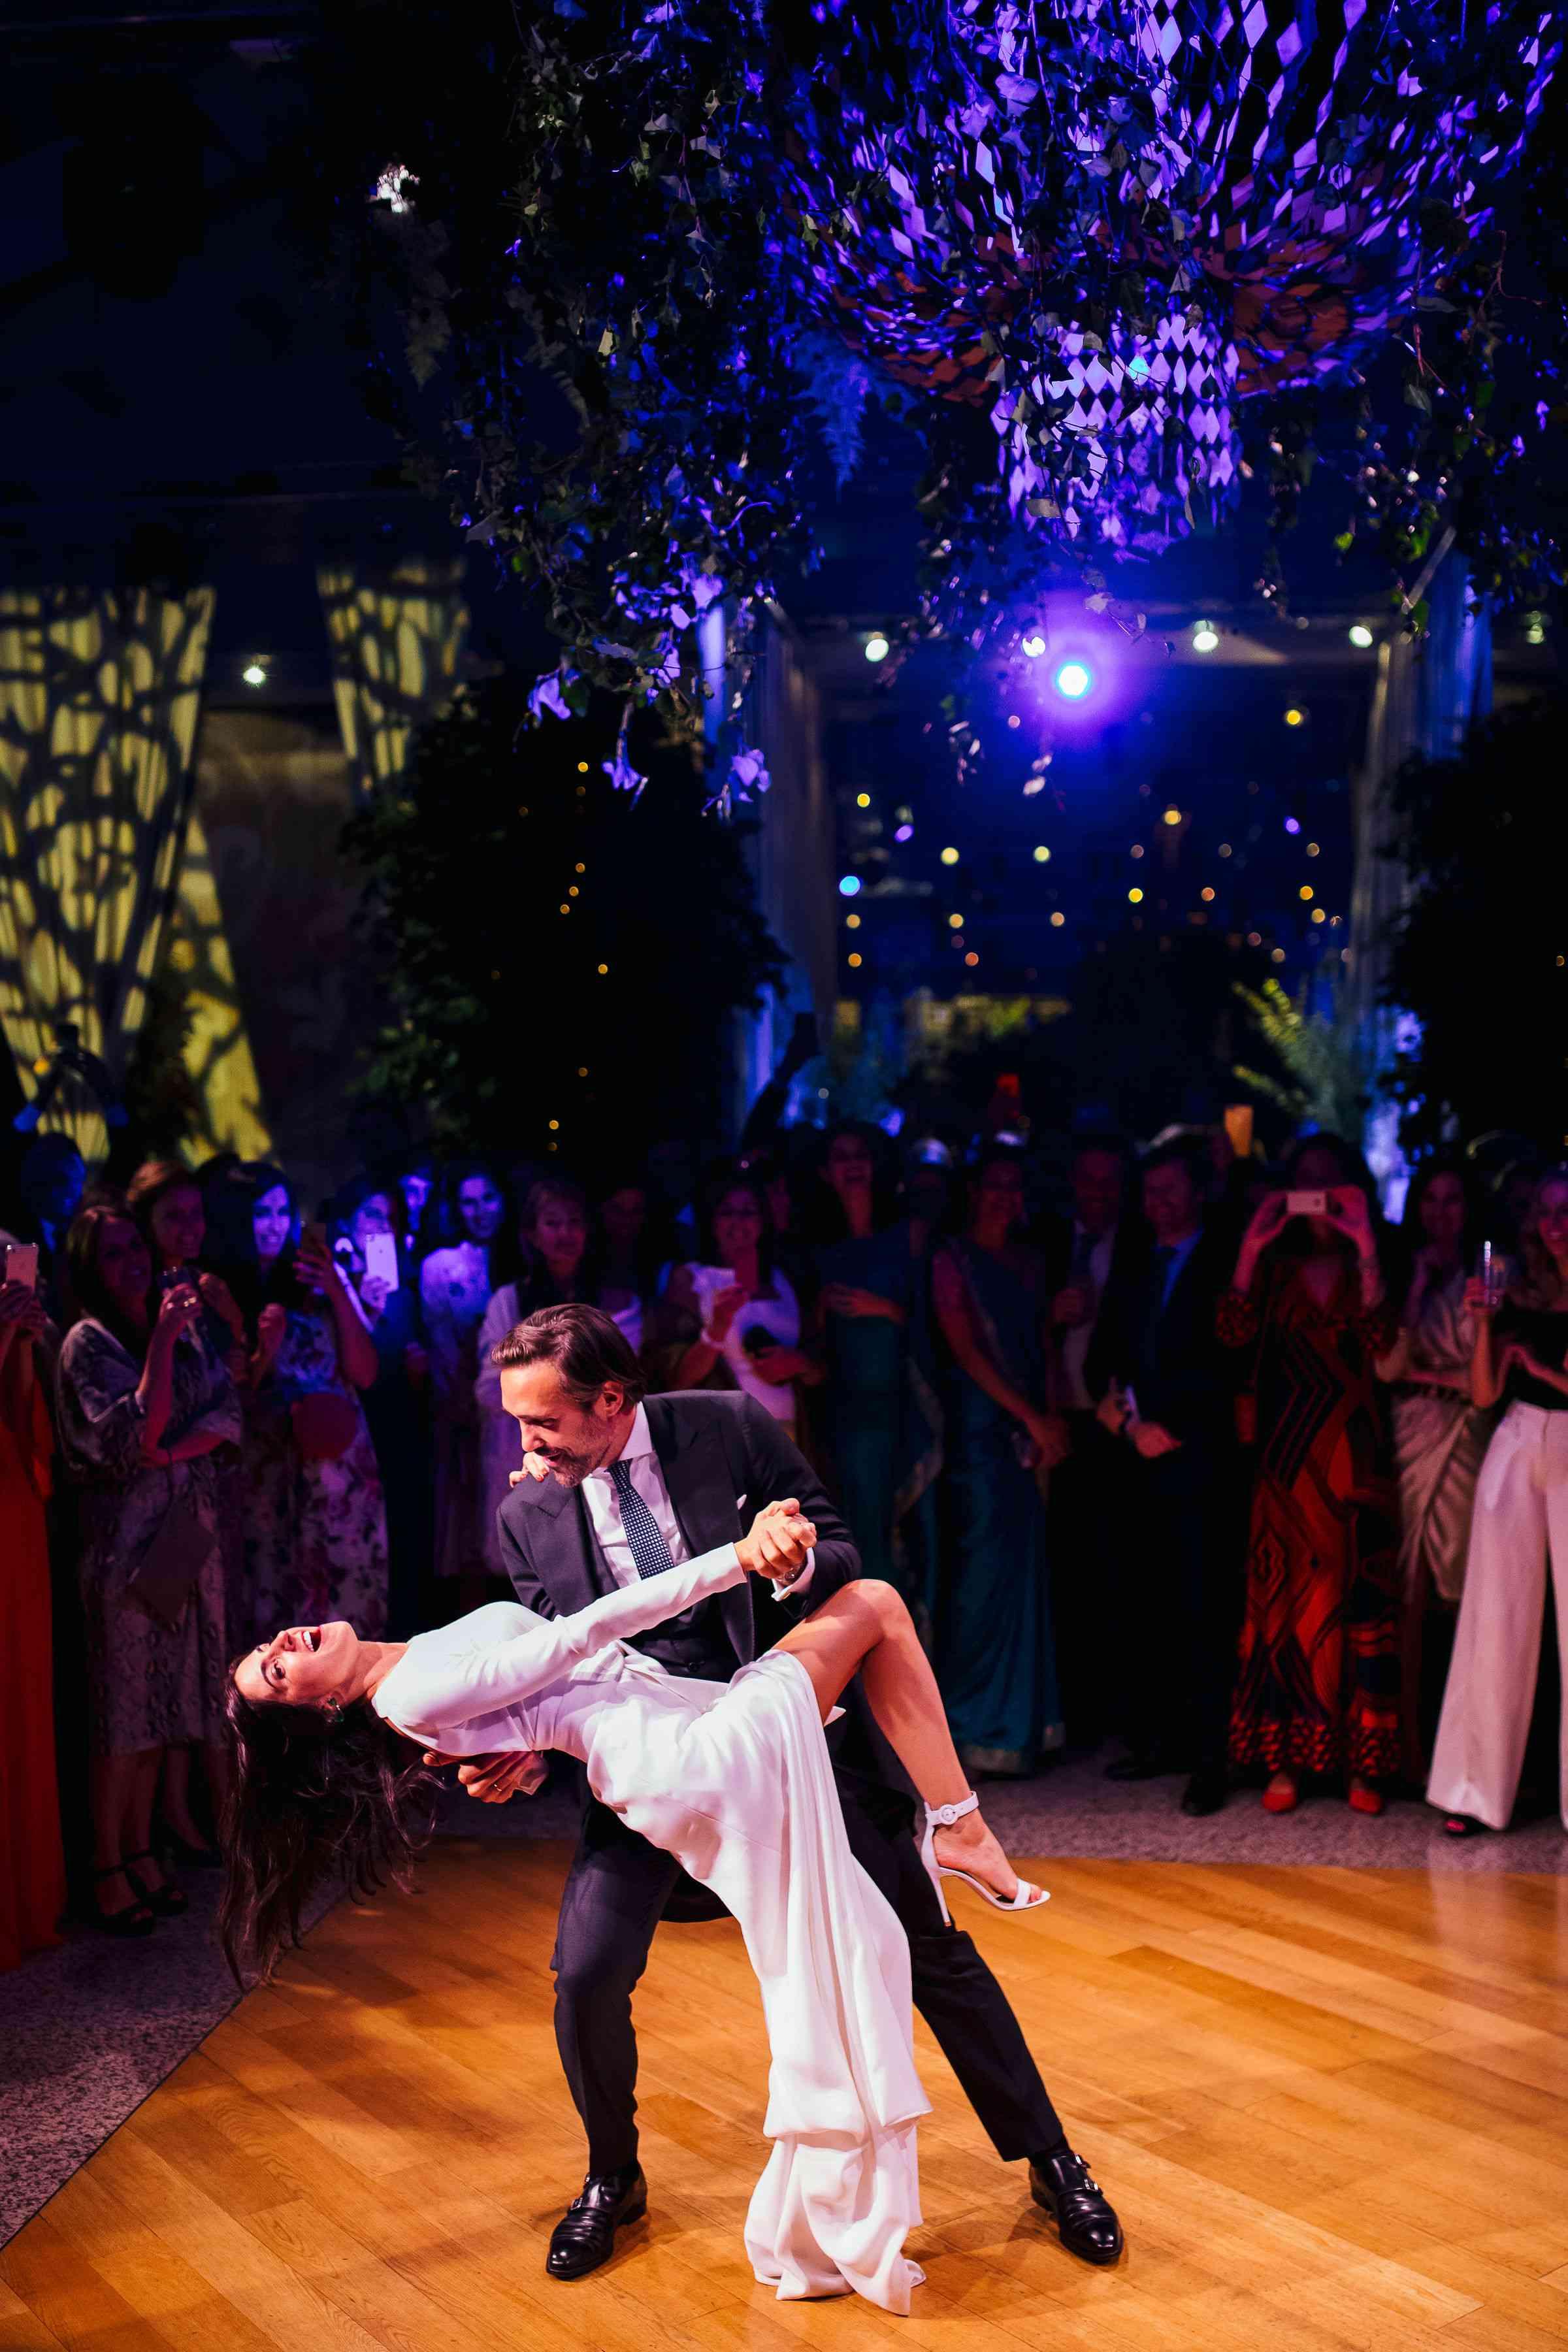 bride and groom dancing, first dance